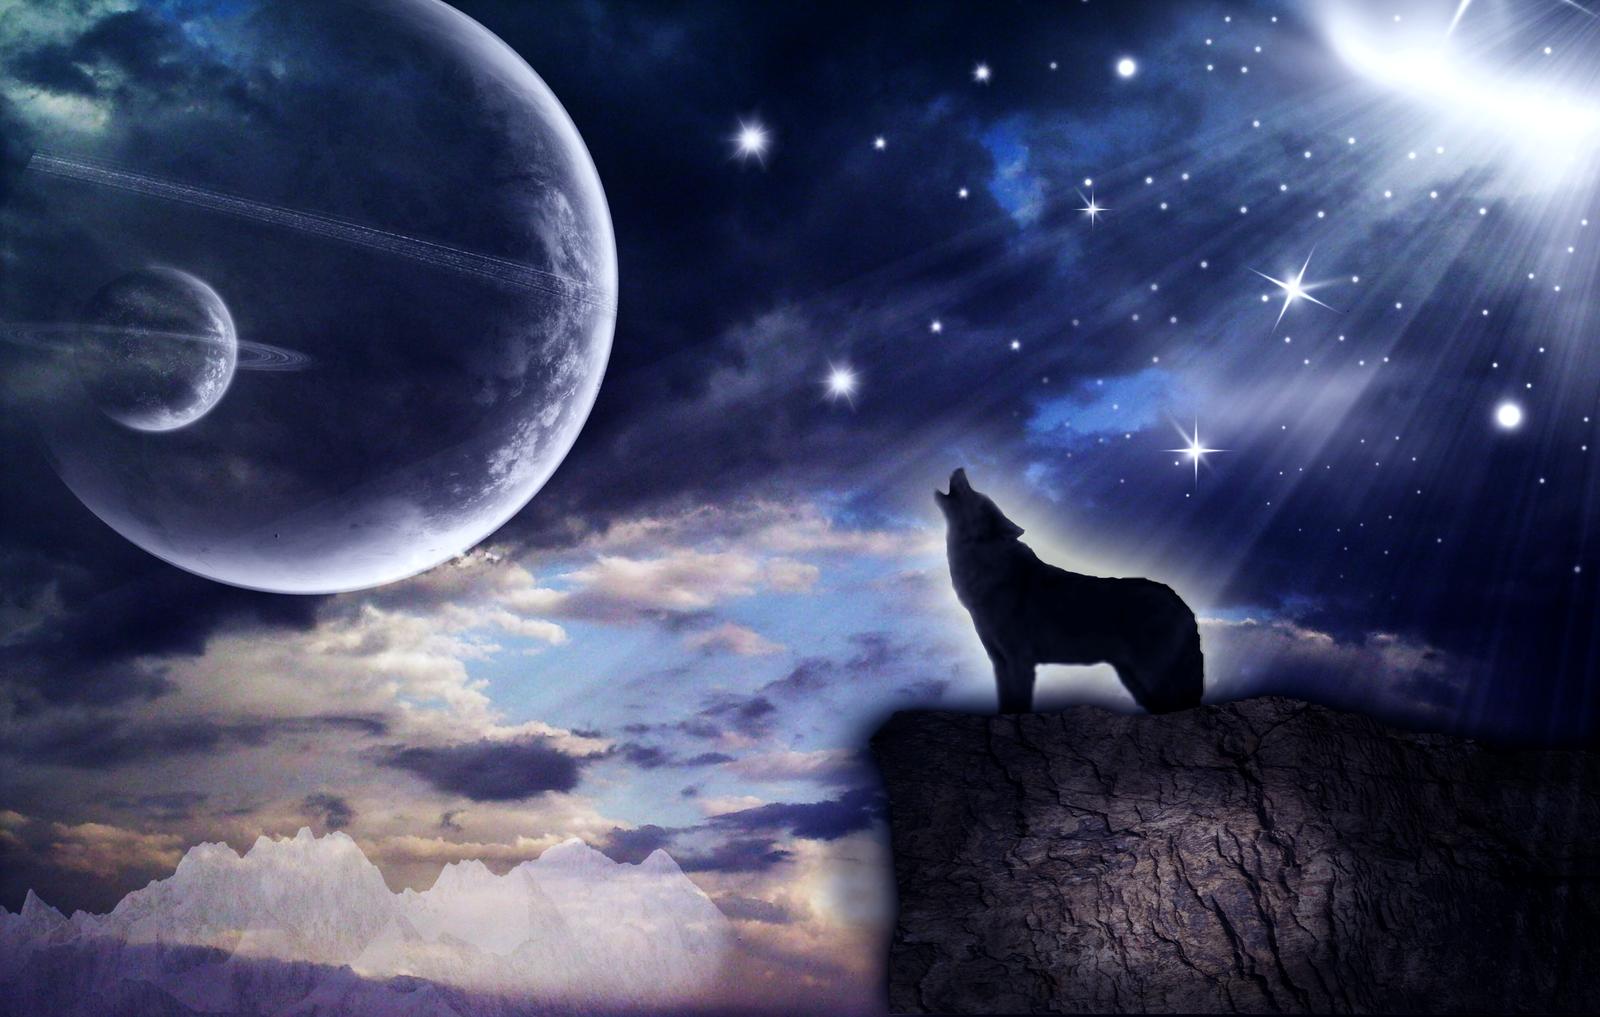 howling wolf by mindraiser on deviantart